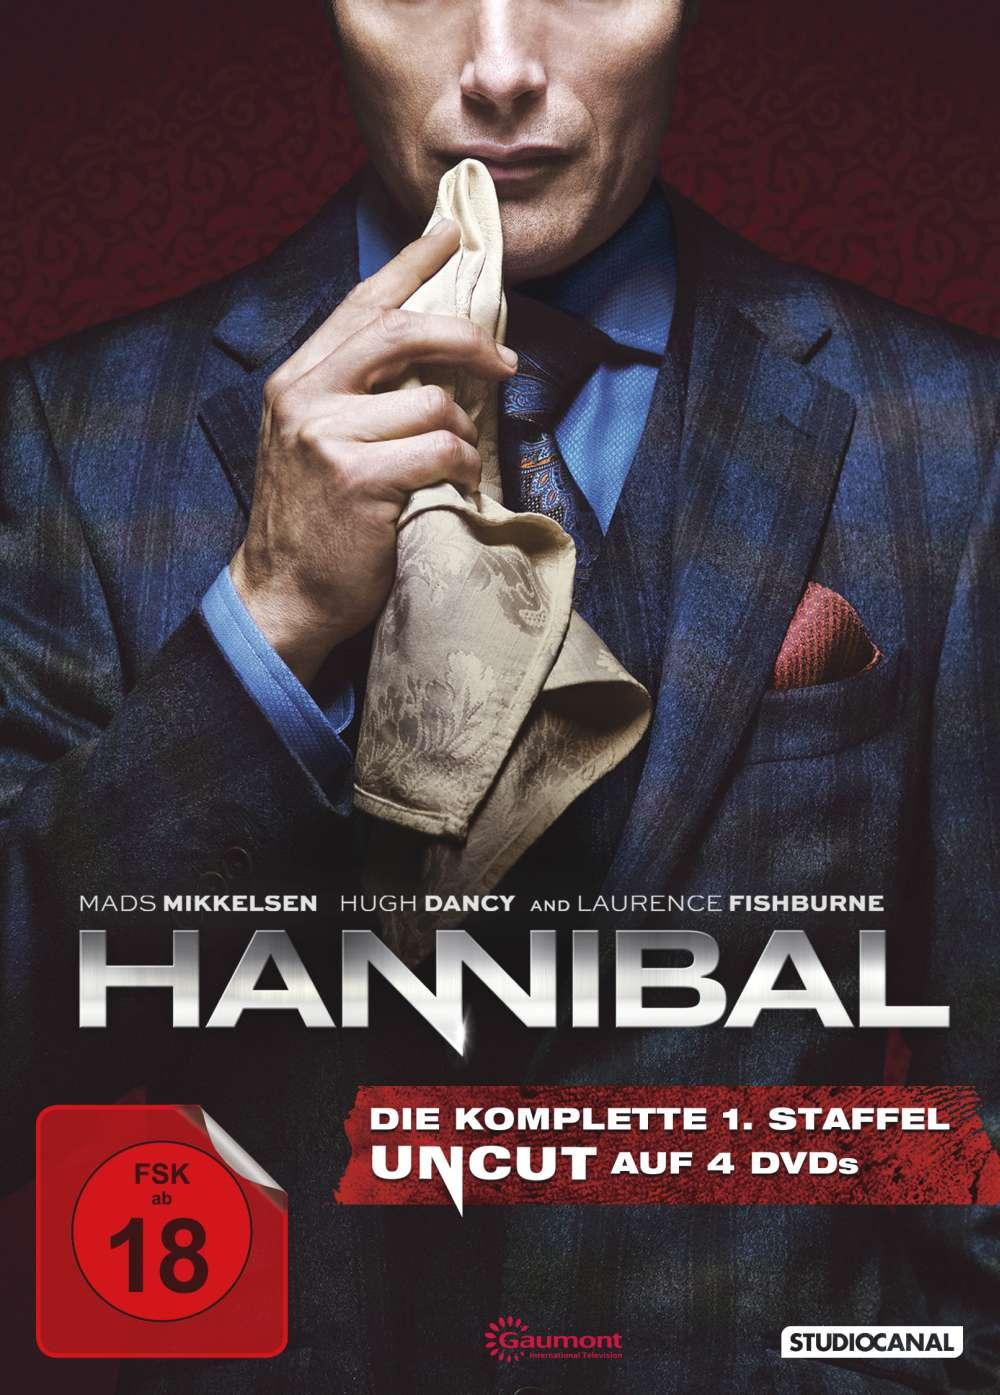 hannibal 1 staffel film 2013 scary. Black Bedroom Furniture Sets. Home Design Ideas